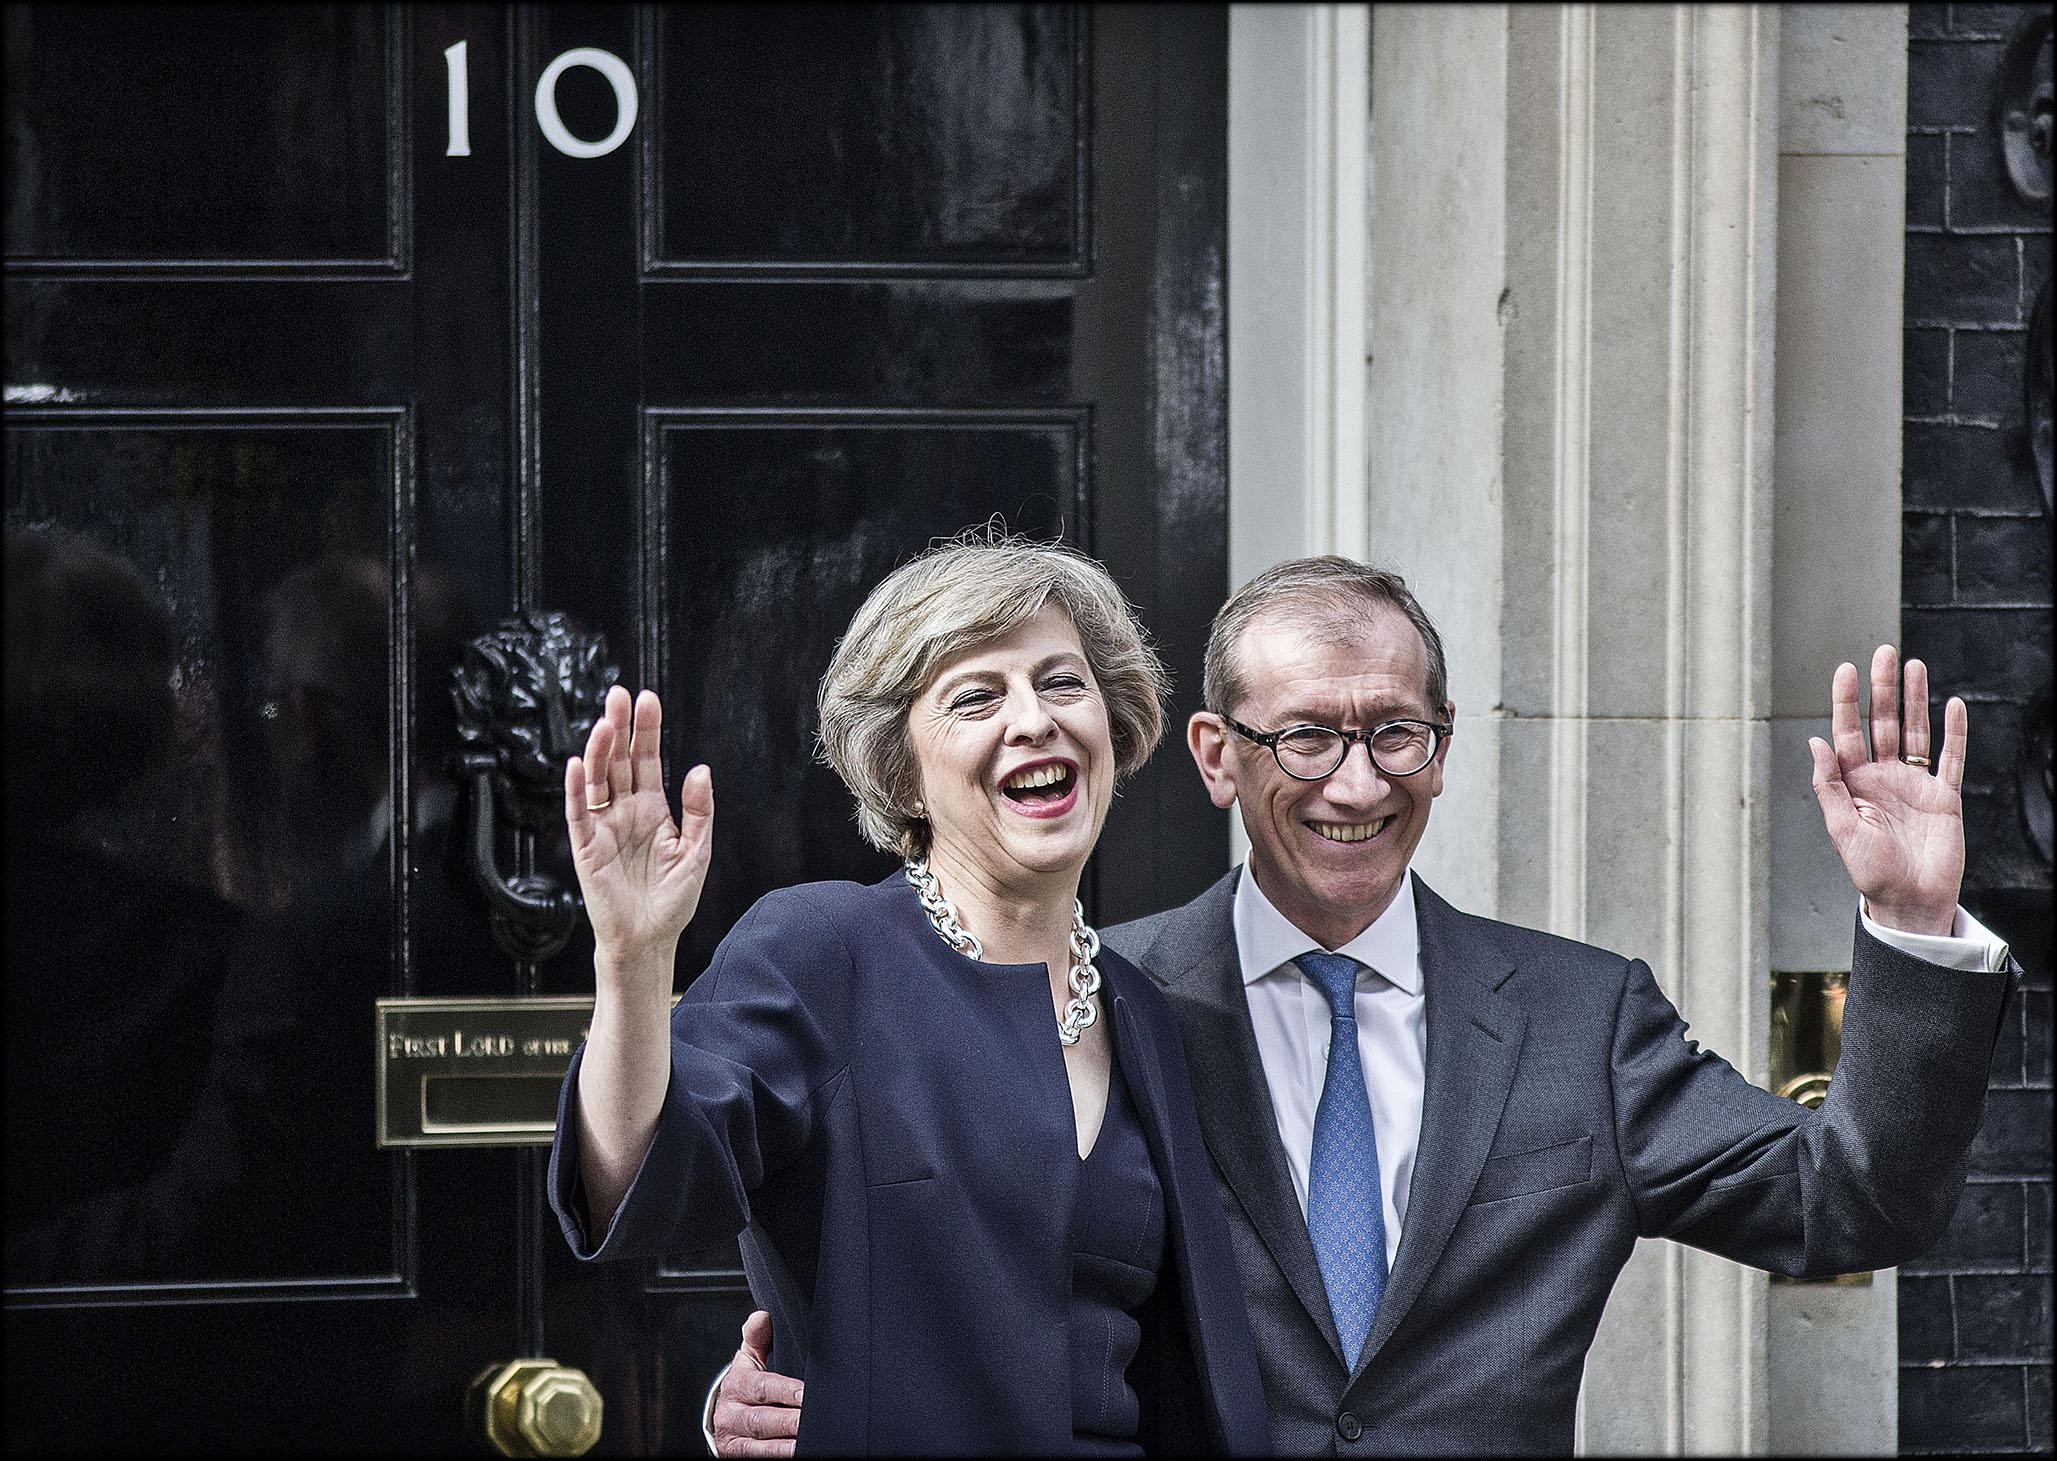 theresa may - prime minister